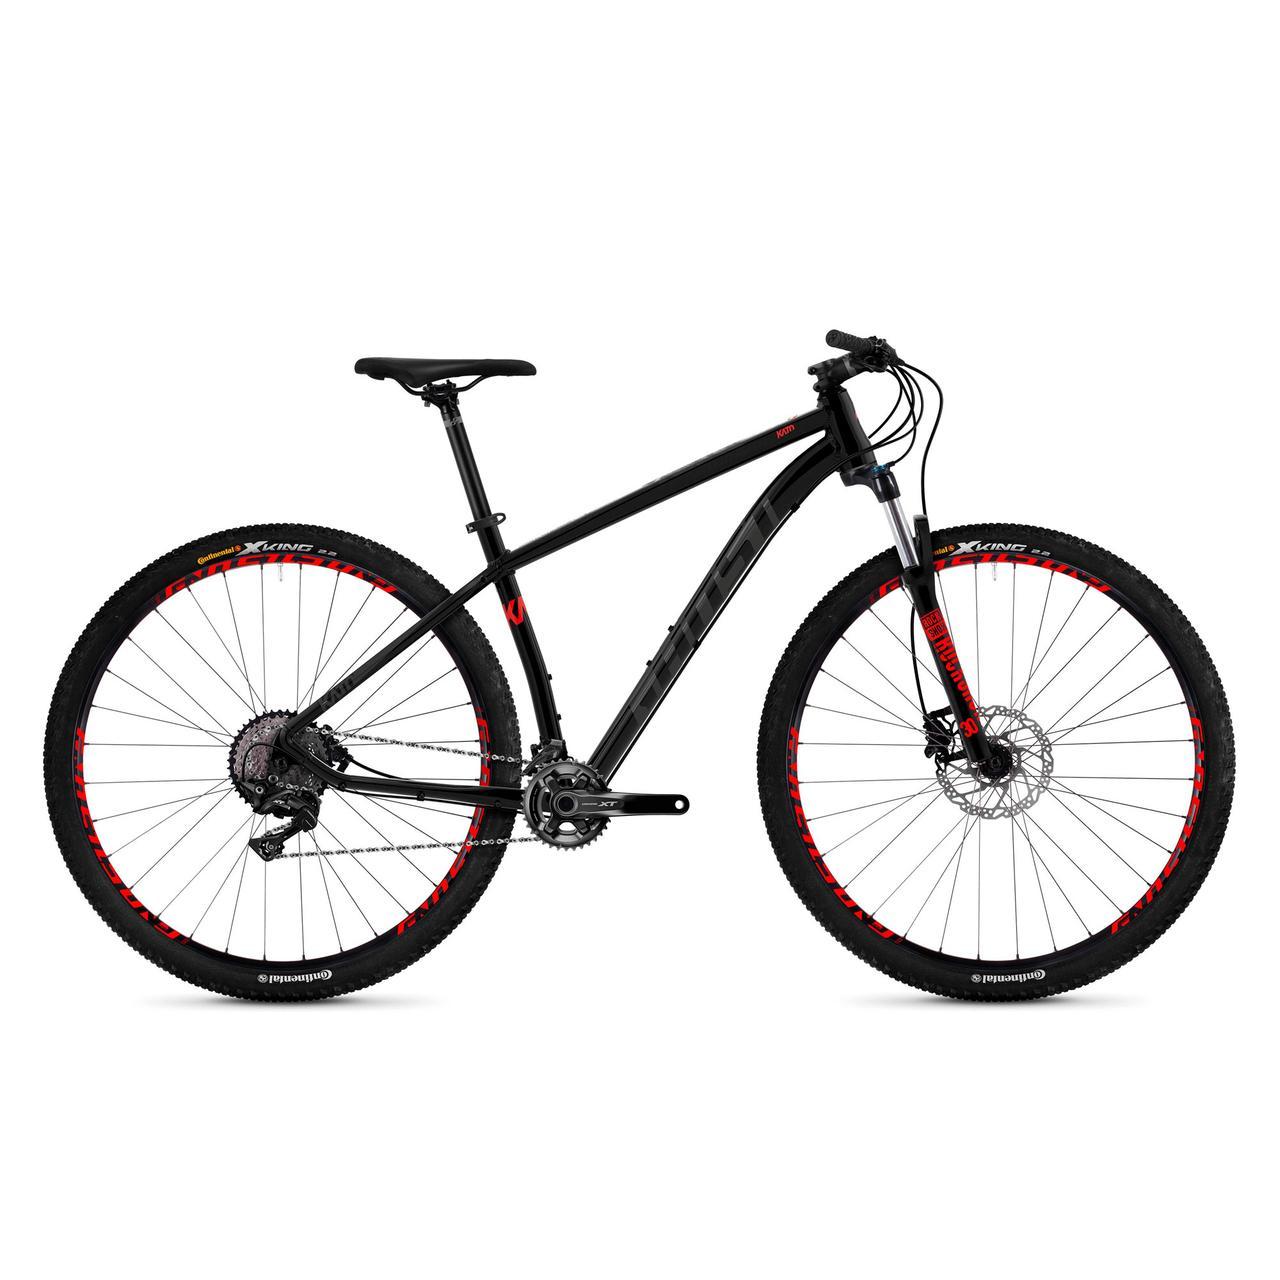 "Велосипед Ghost Kato 9.9 29"" рама L, черно-серо-красный, 2019"